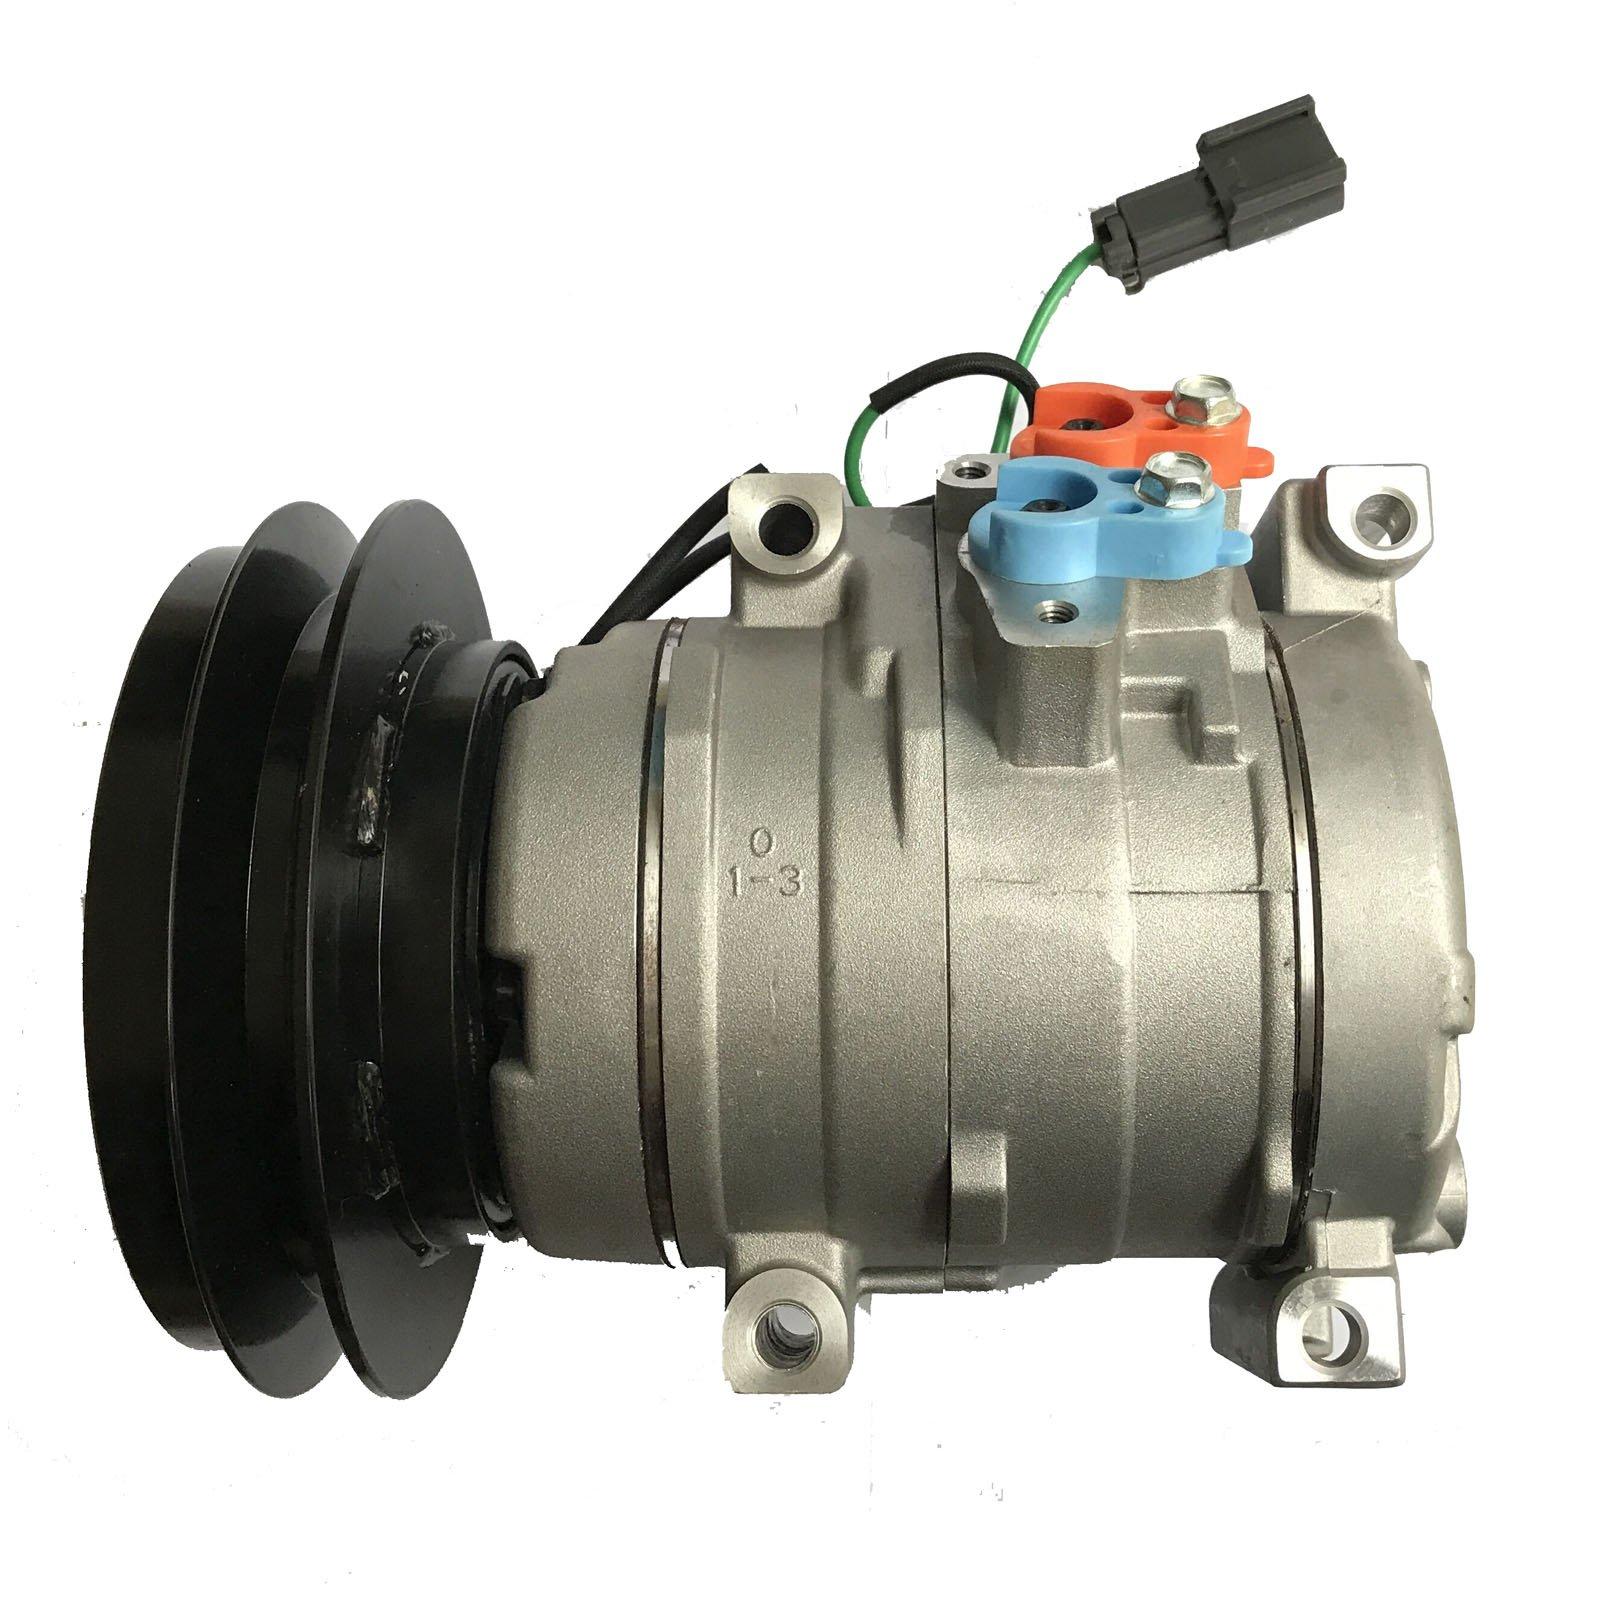 Holdwell Compressor 4431081 for John Deere 120C 160C LC 180CW Excavator